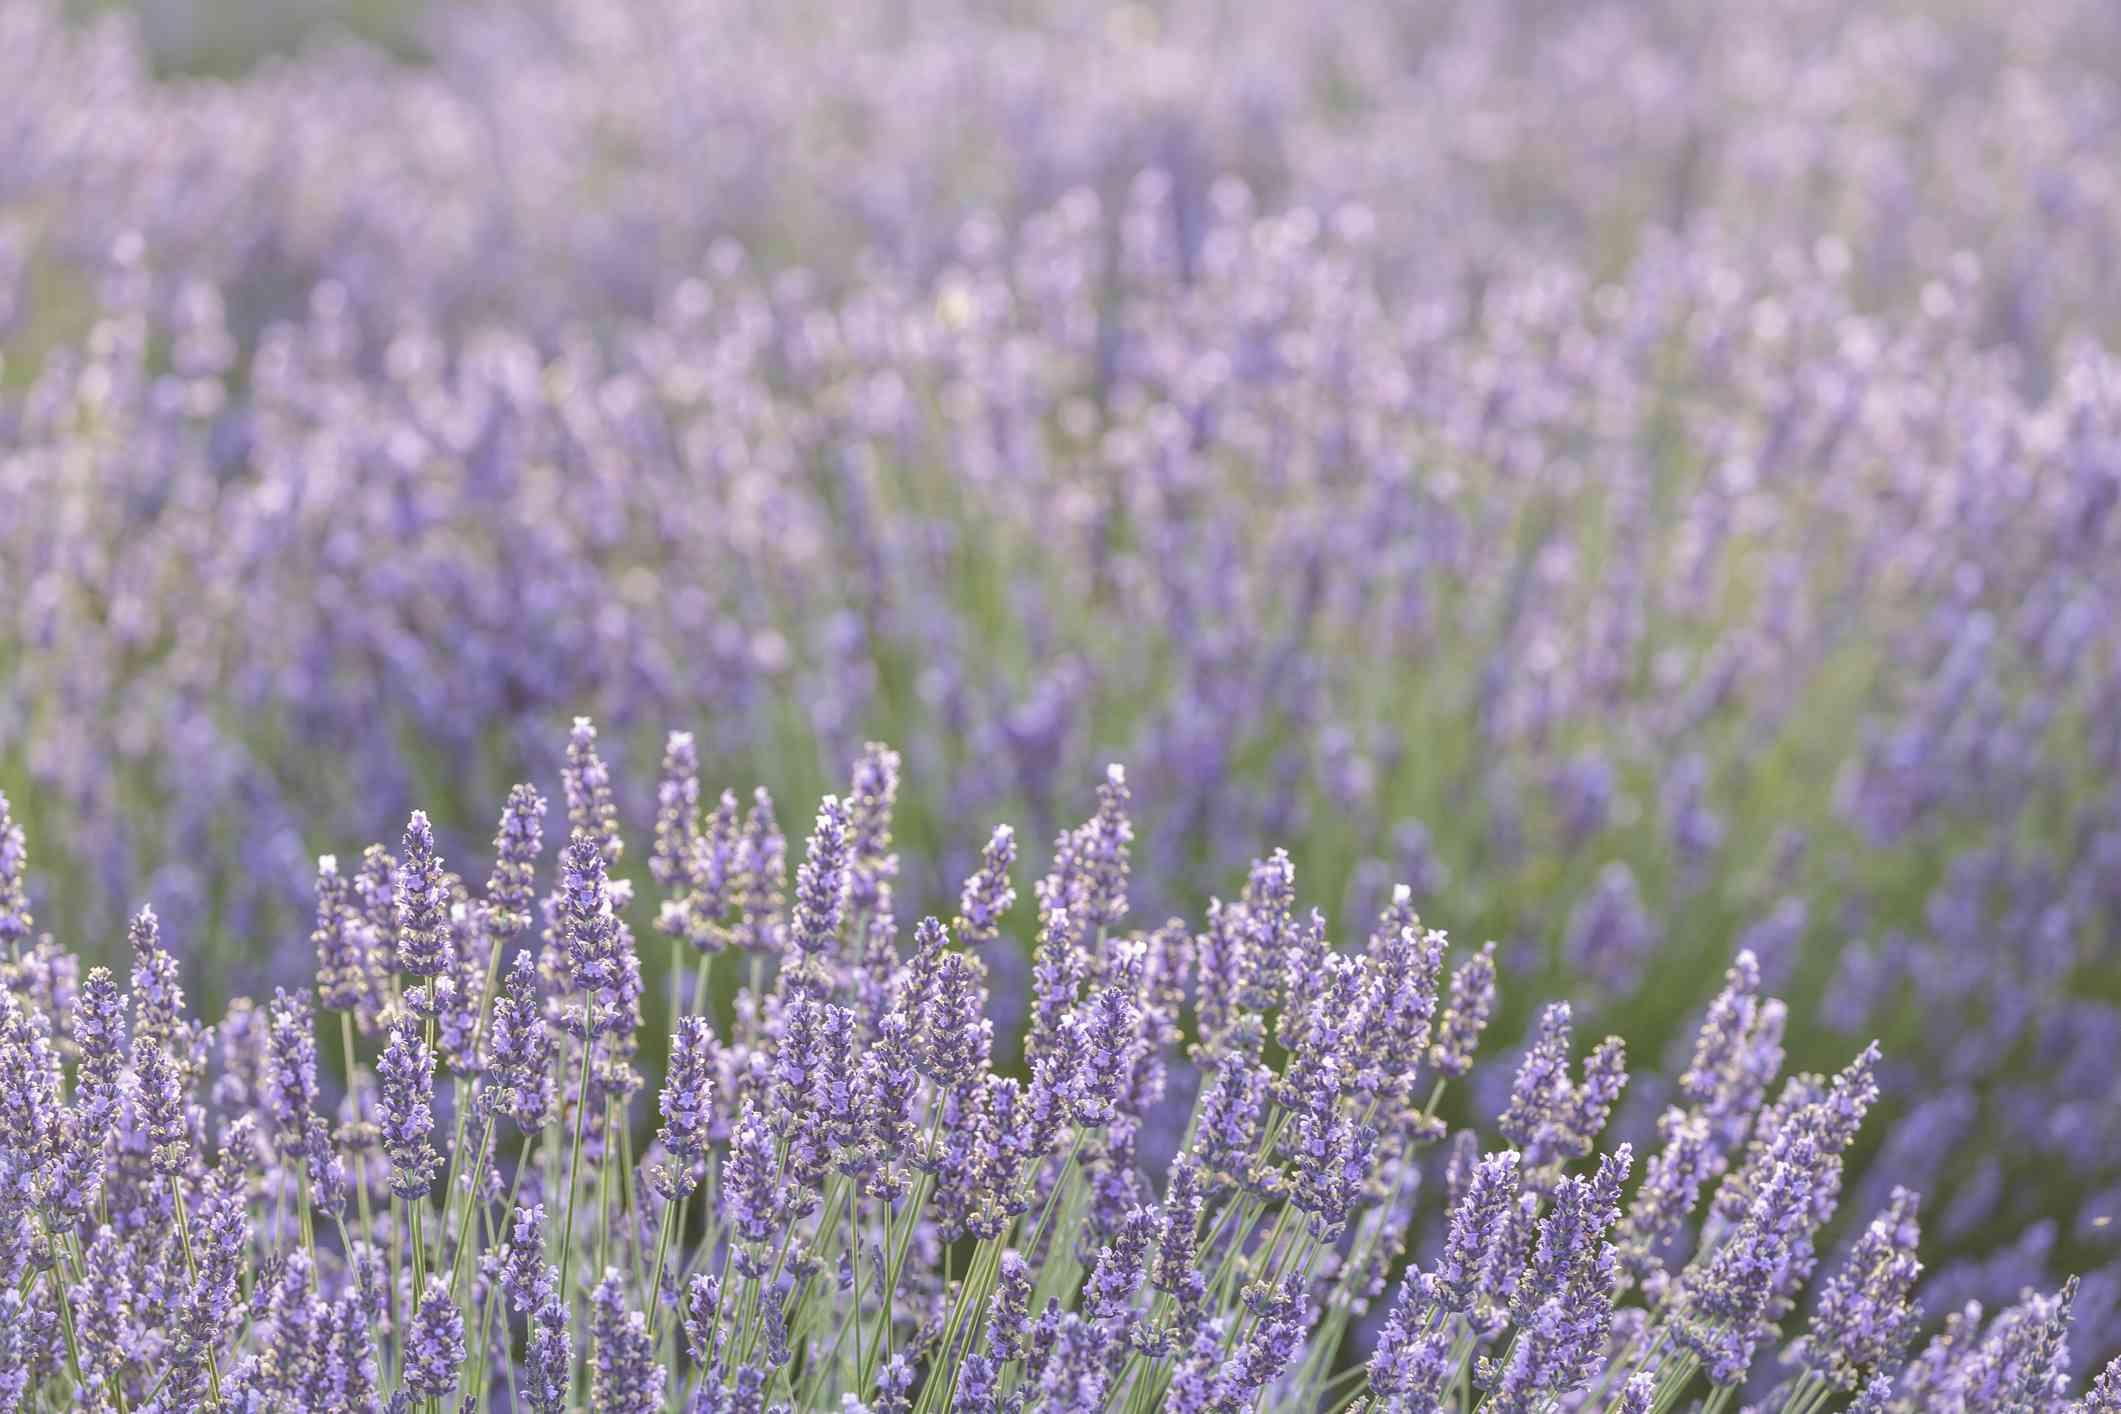 Backlit lavender on the Plateau de Valensole, France.